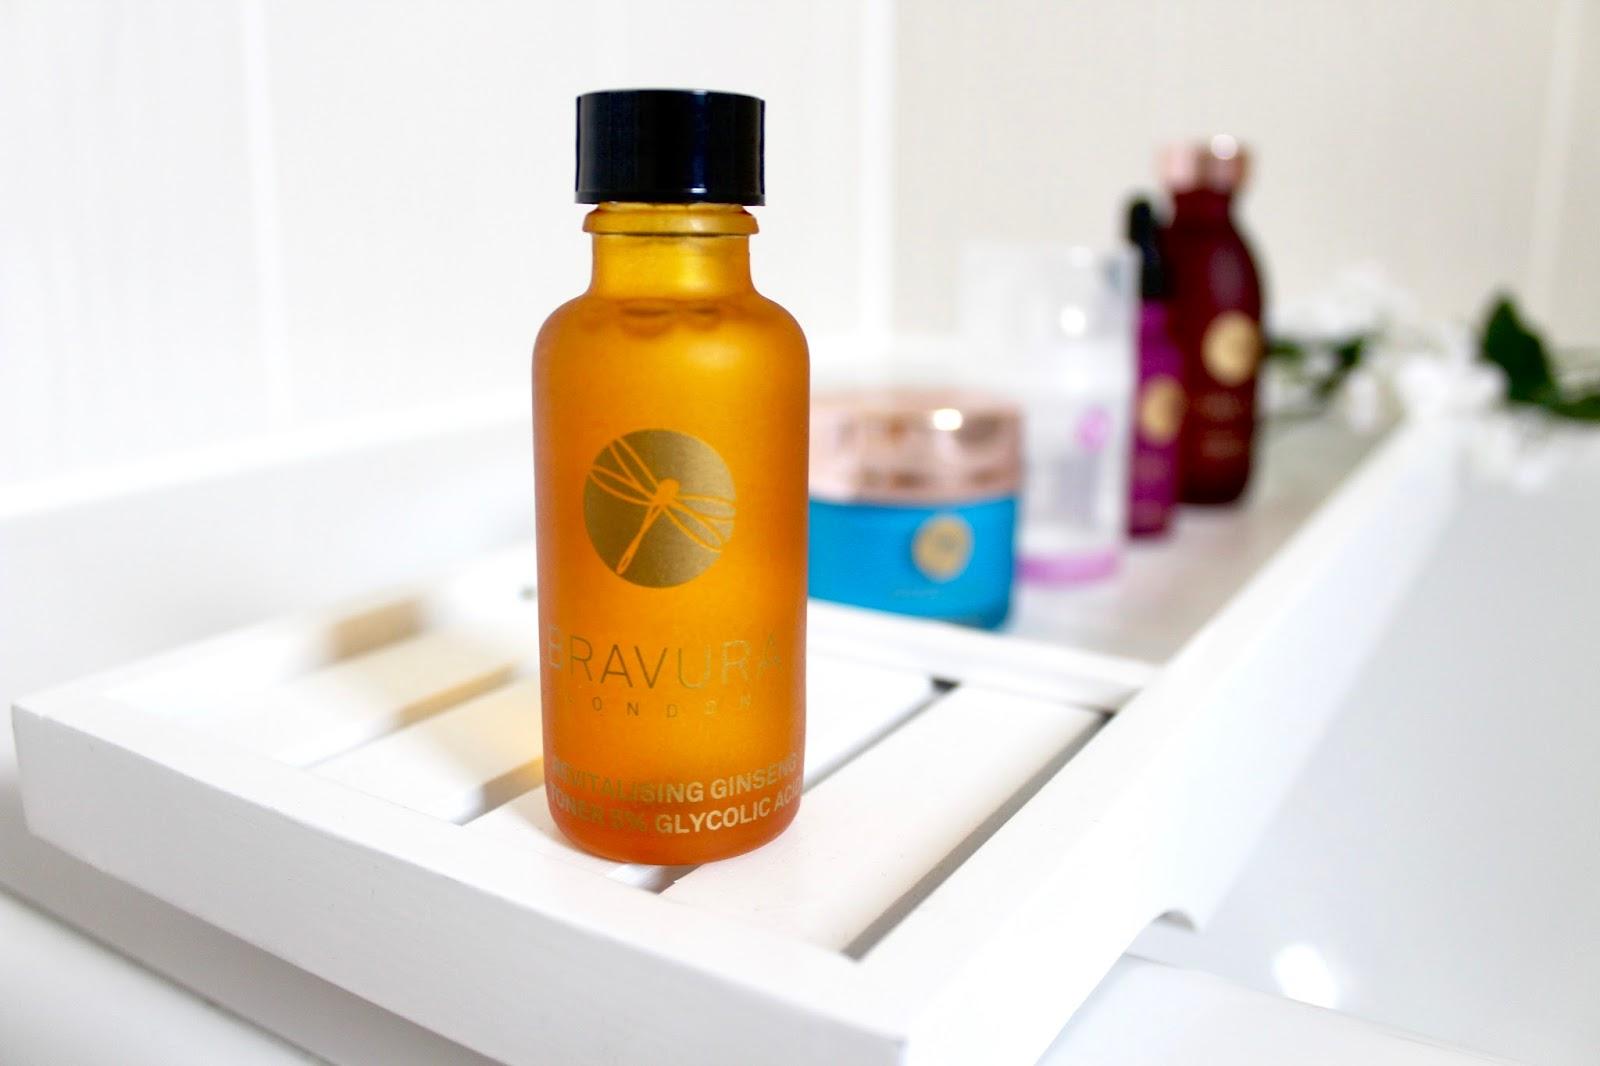 Revitalising Ginseng Toner with Glycolic Acid 5%